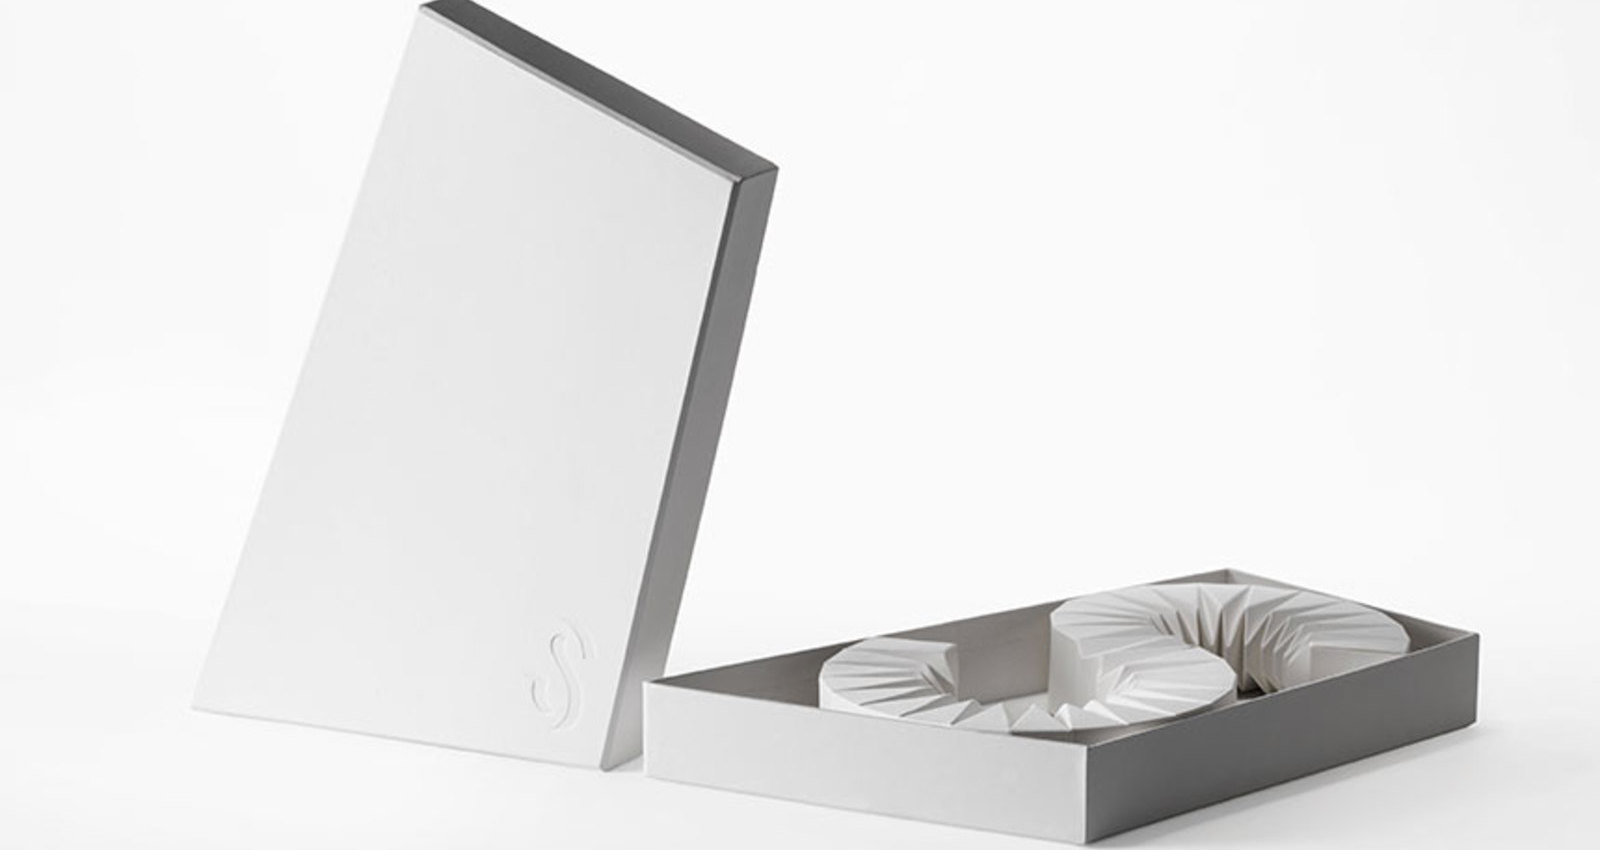 The Design S Award 2014